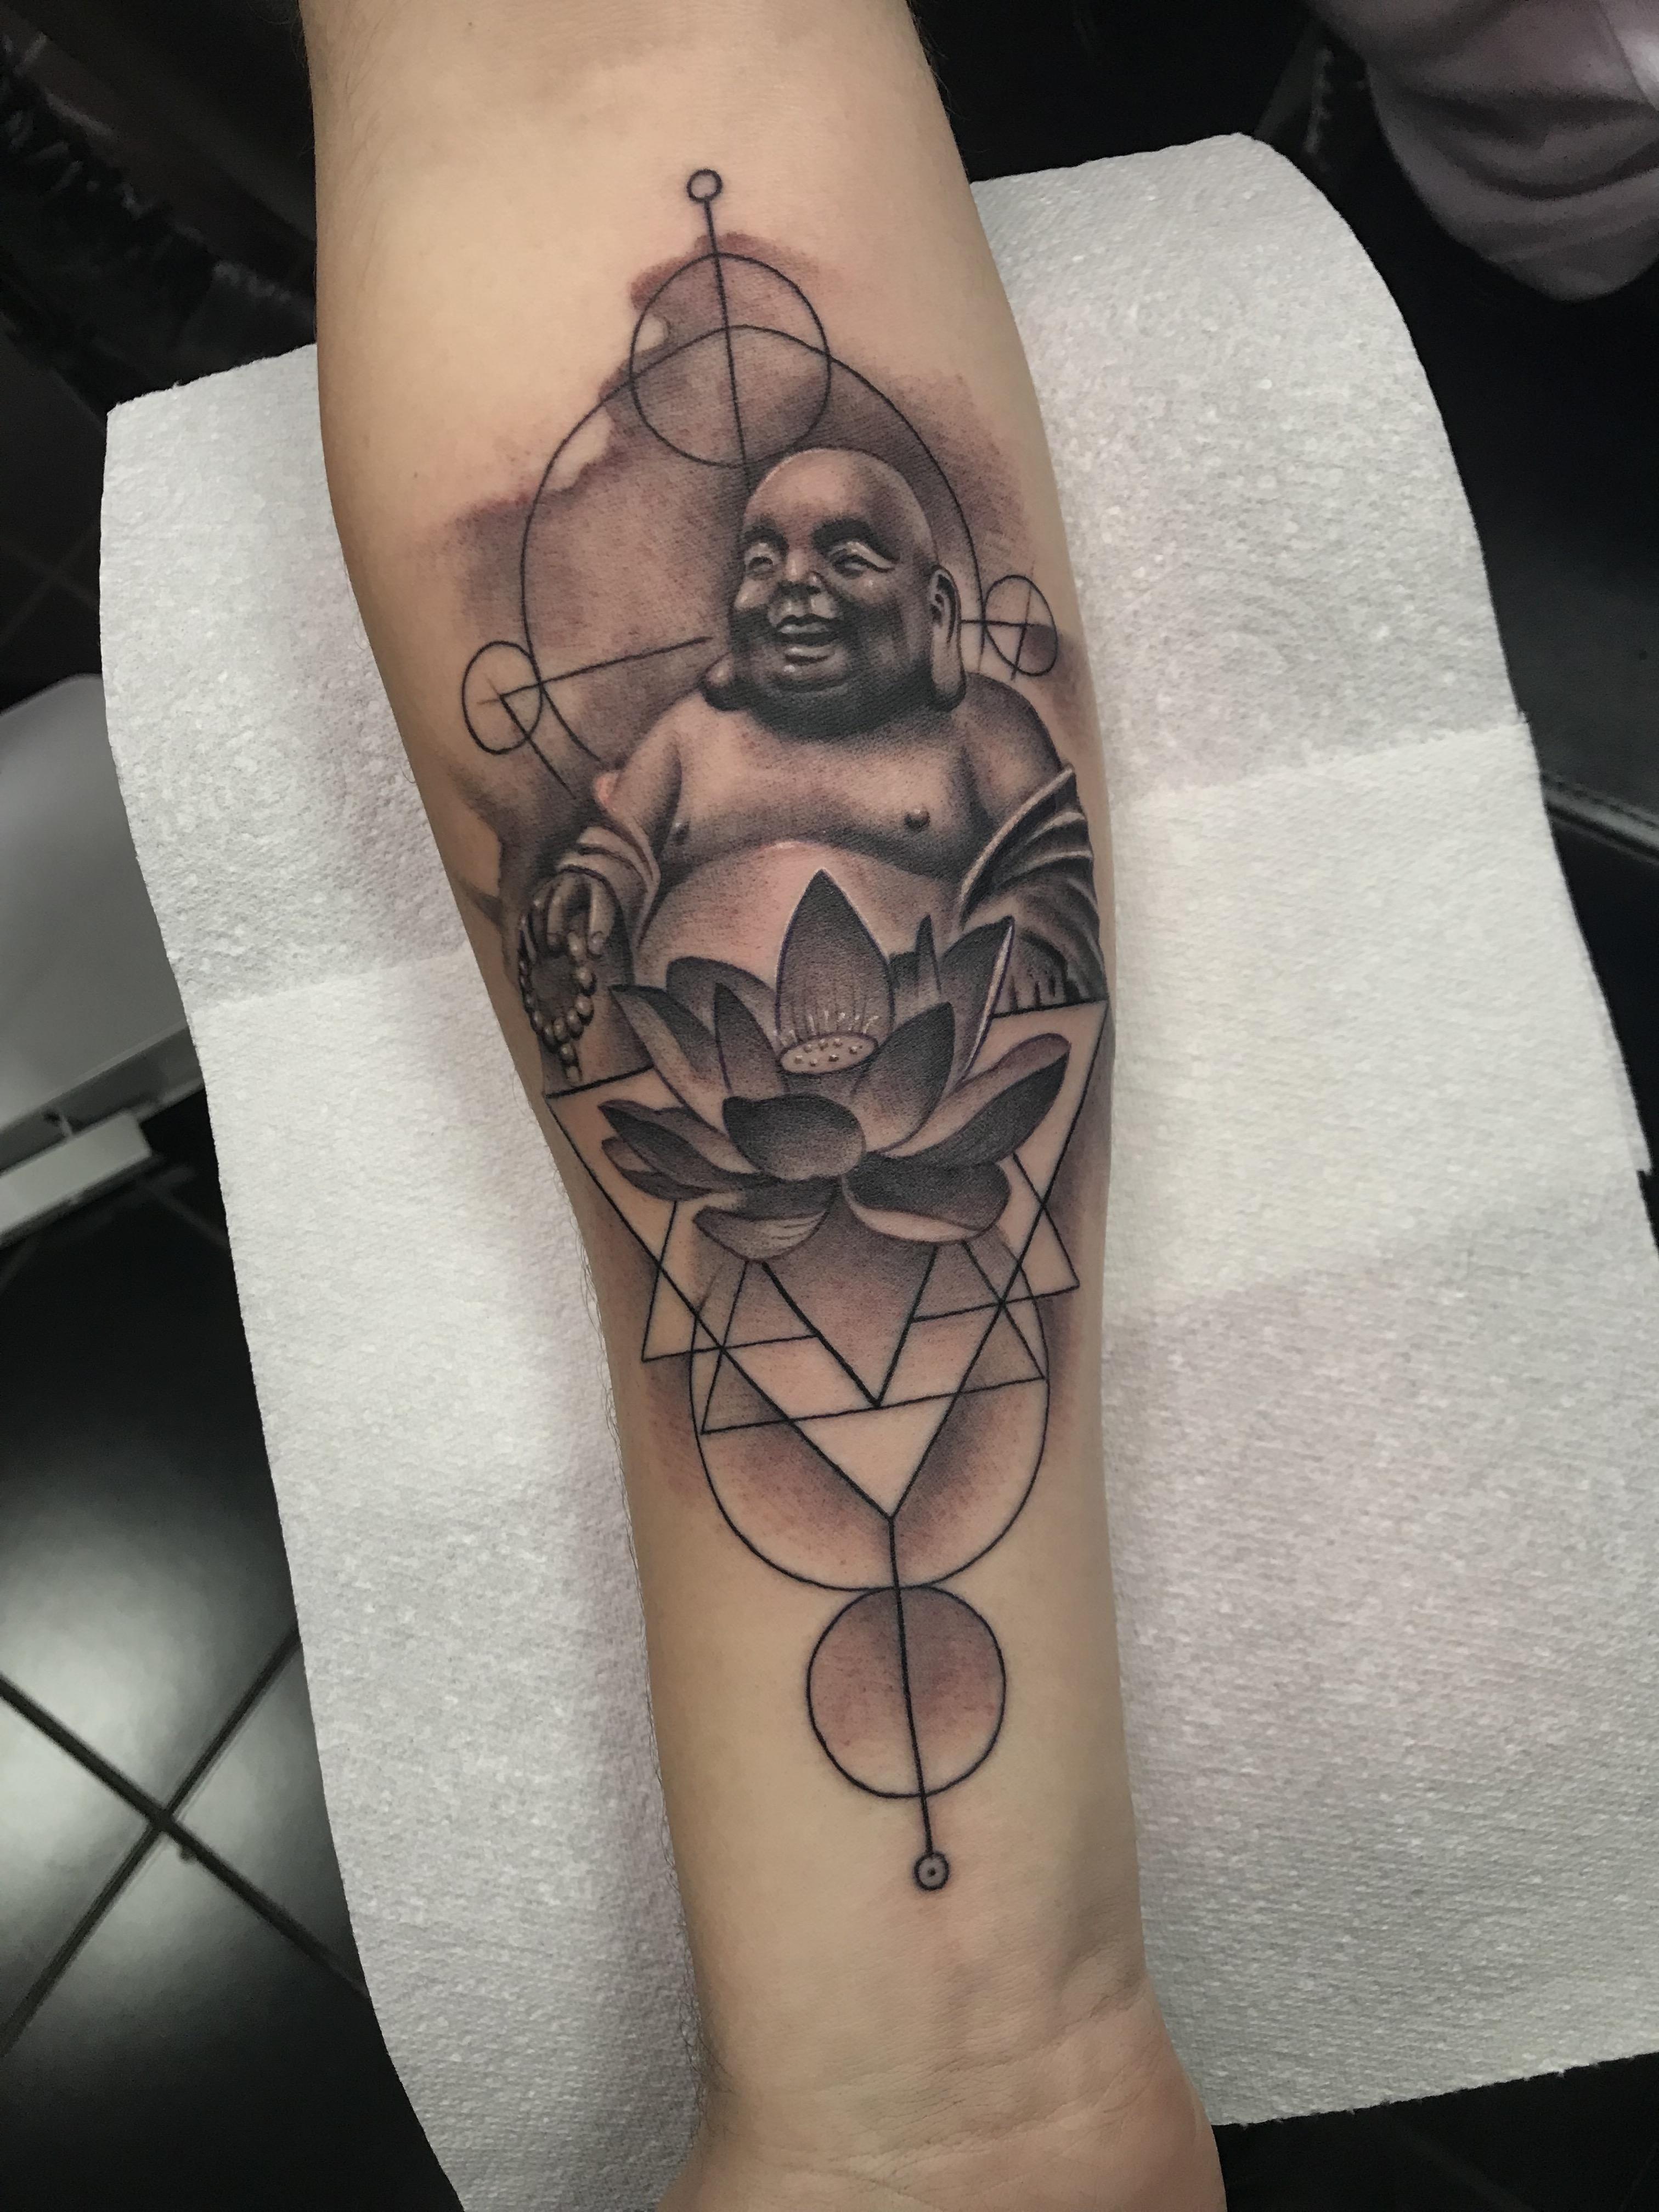 My first tattoo! Done by JJ at AwakeArise. York UK